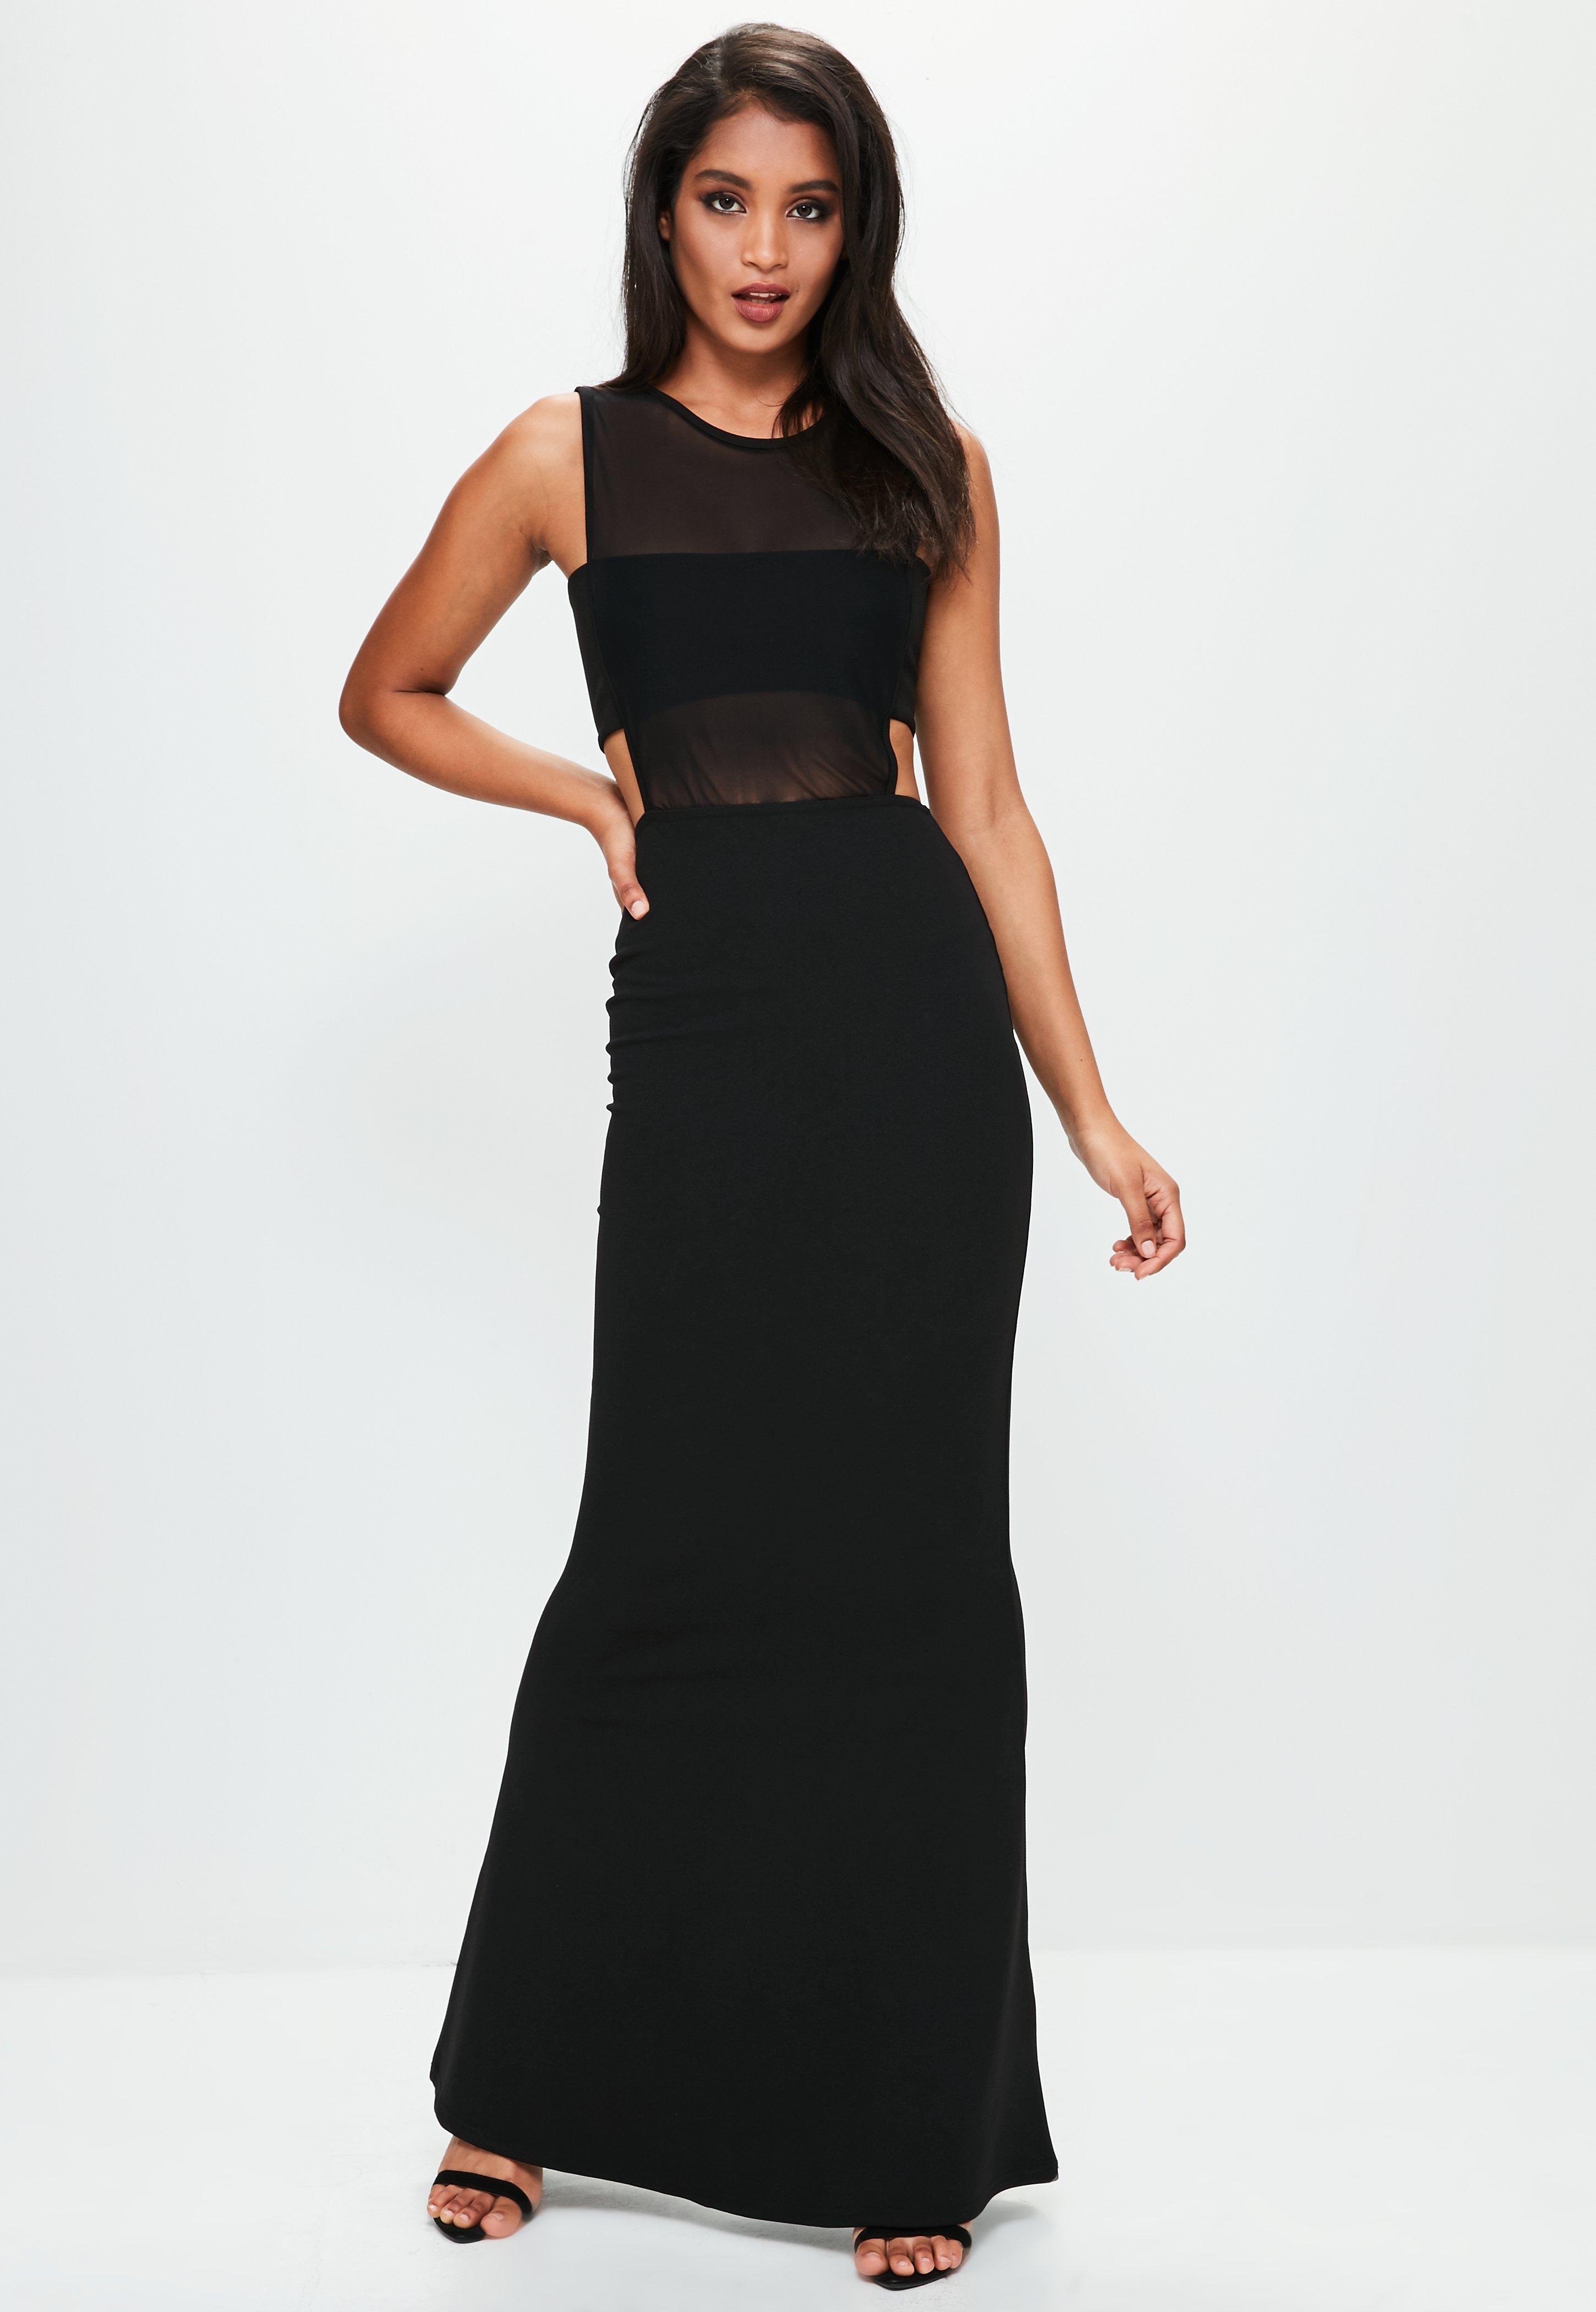 Cut out mesh dress black